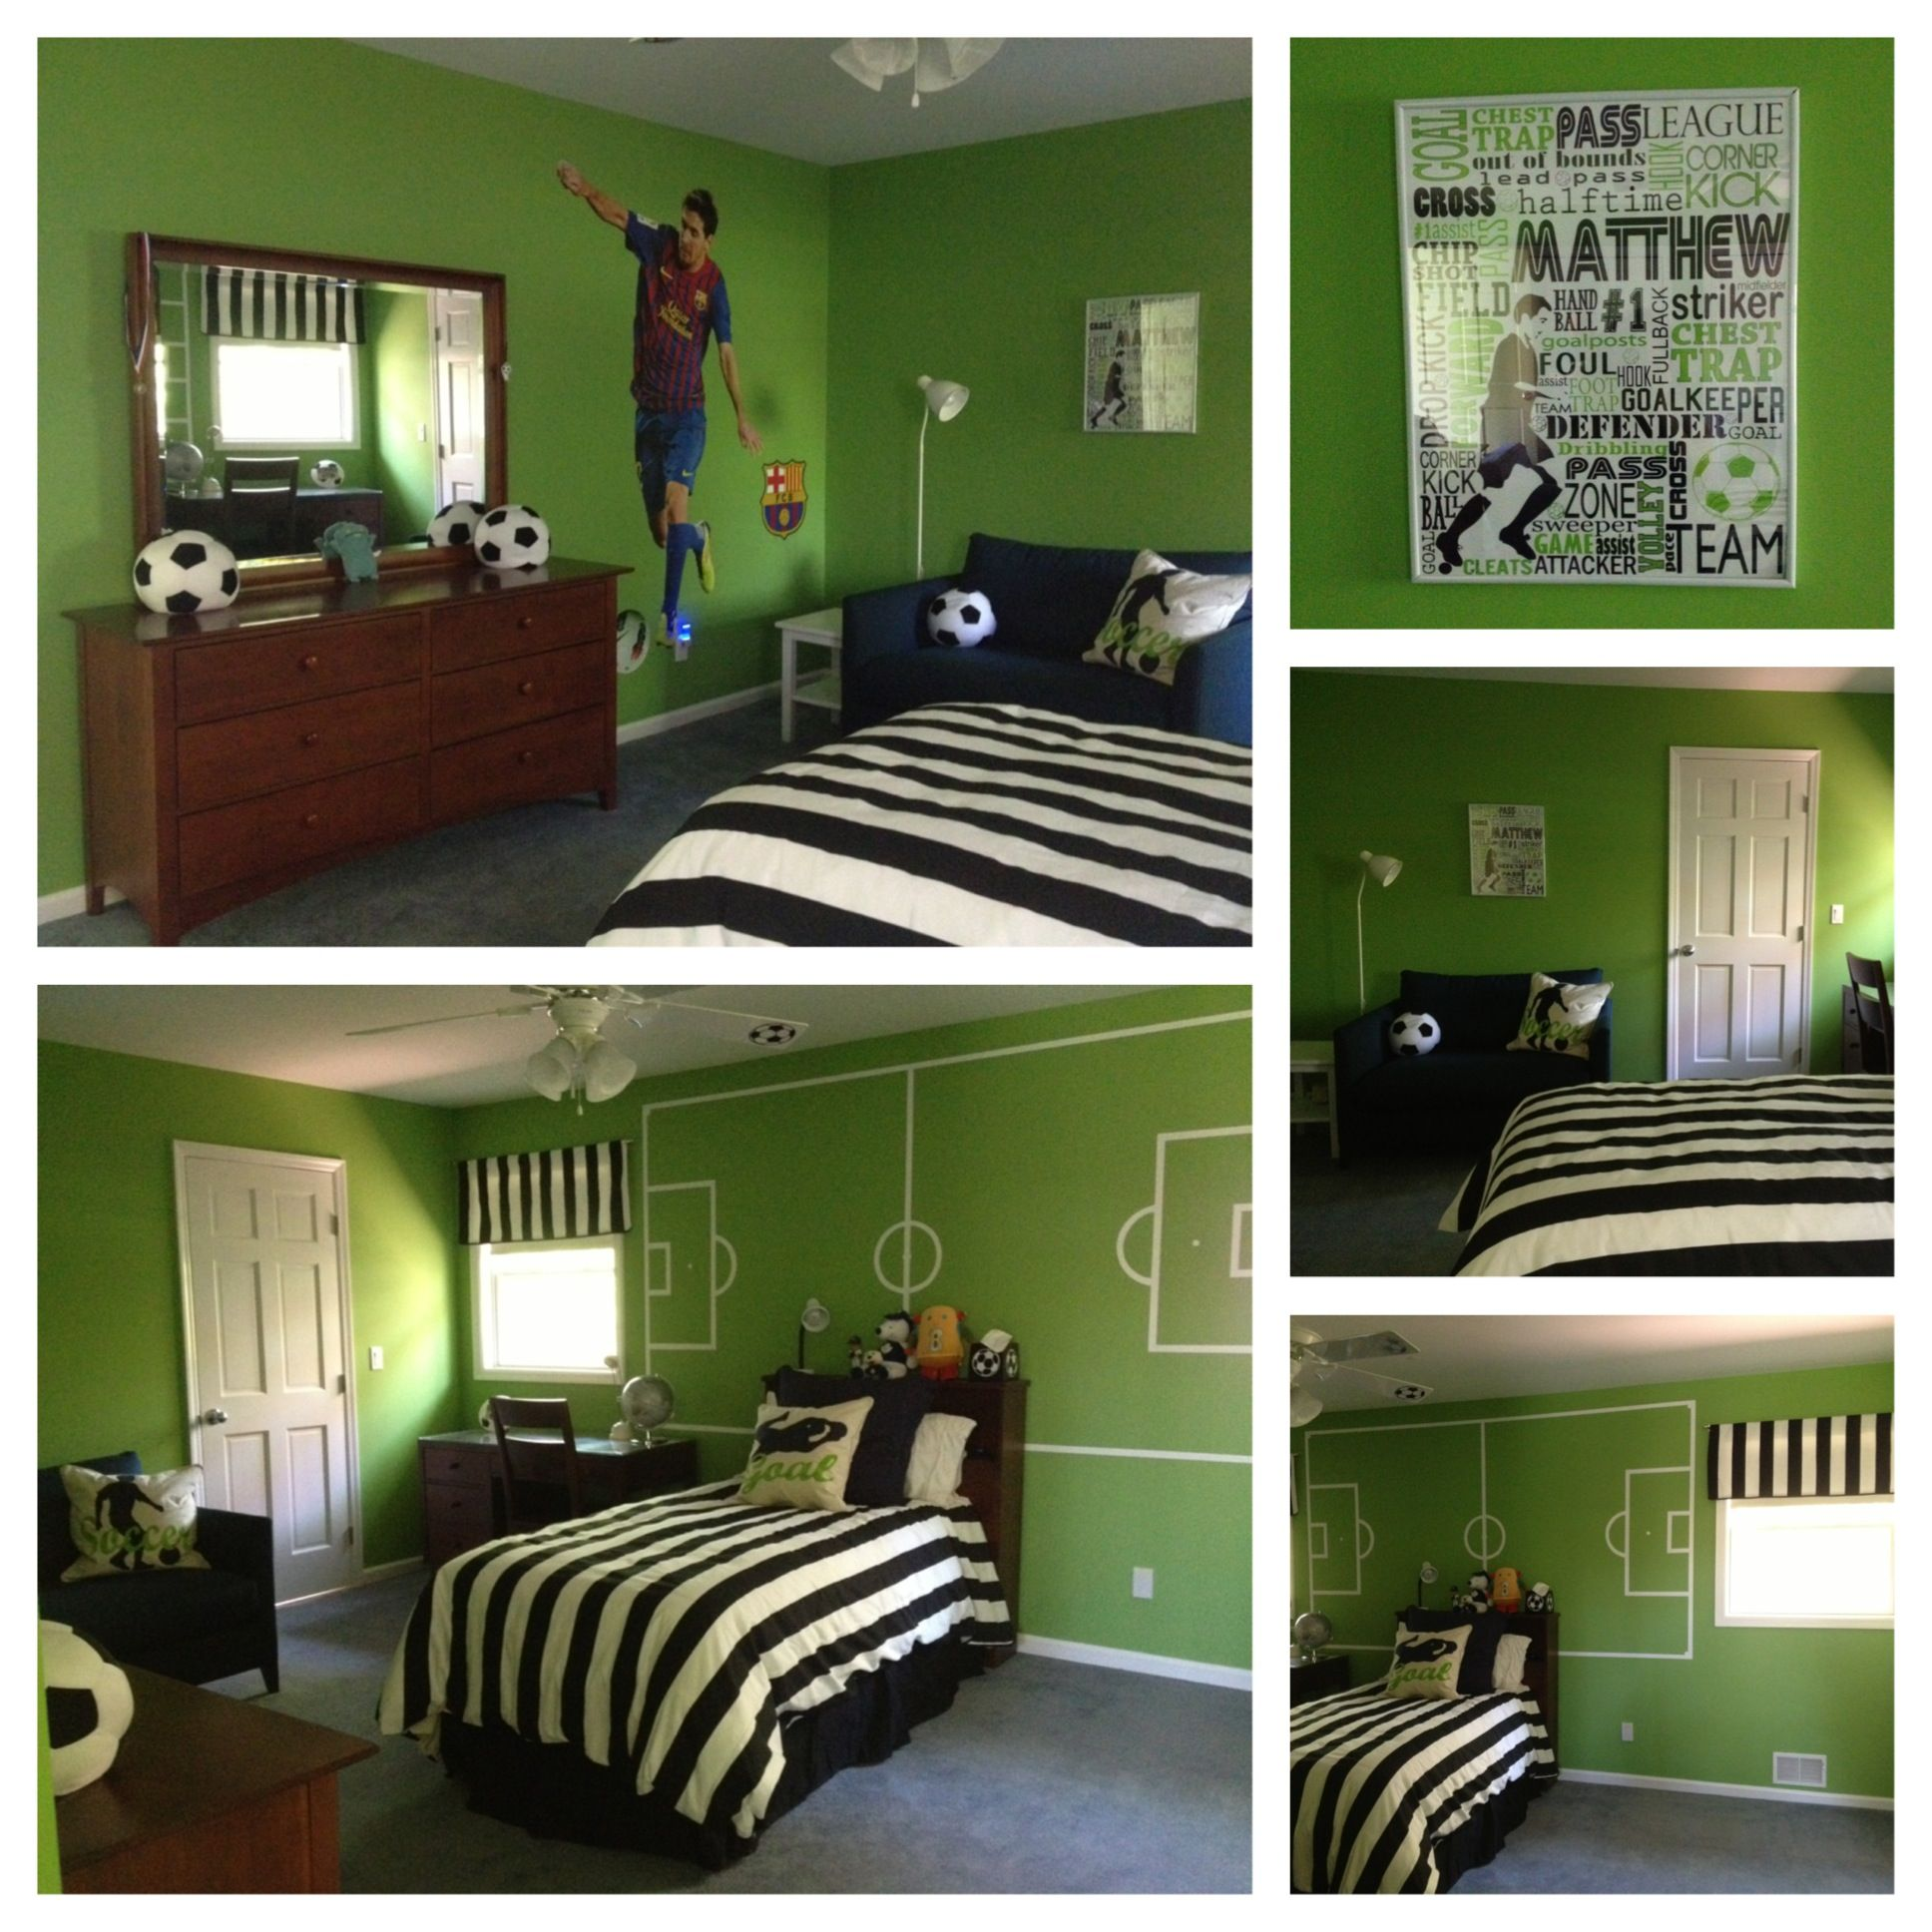 I Finally Finished His Soccer Room Love It Soccer Room Soccer